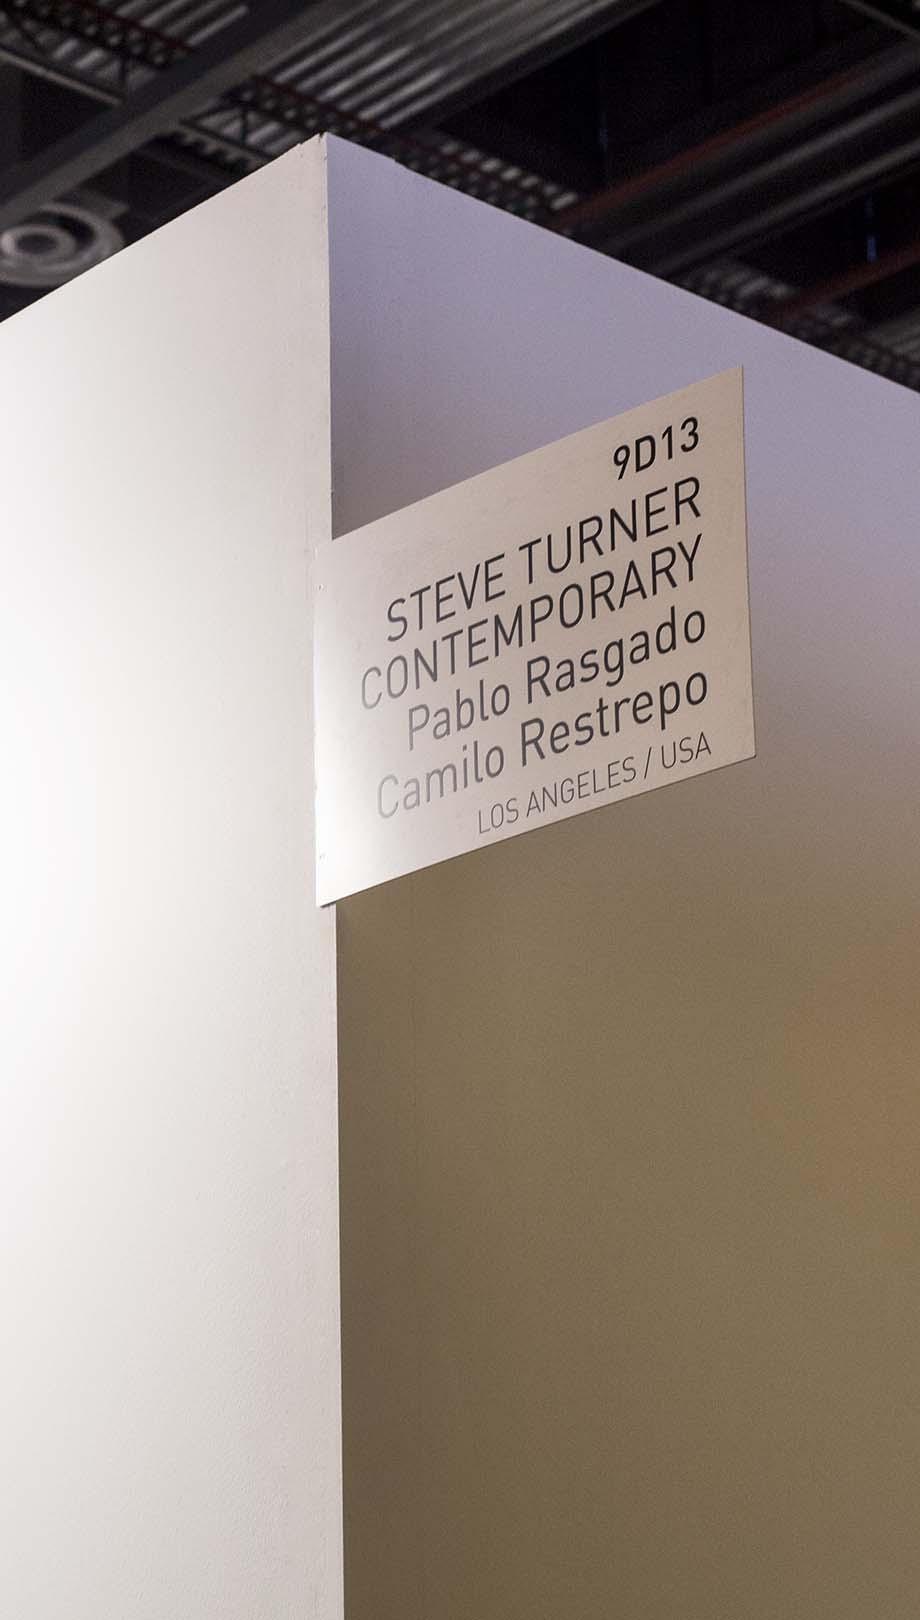 Camilo Restrepo, Pablo Rasgado, Arco, Arco Madrid, Steve Turner, Los Angeles, Colombia, Mexico City, contemporary art